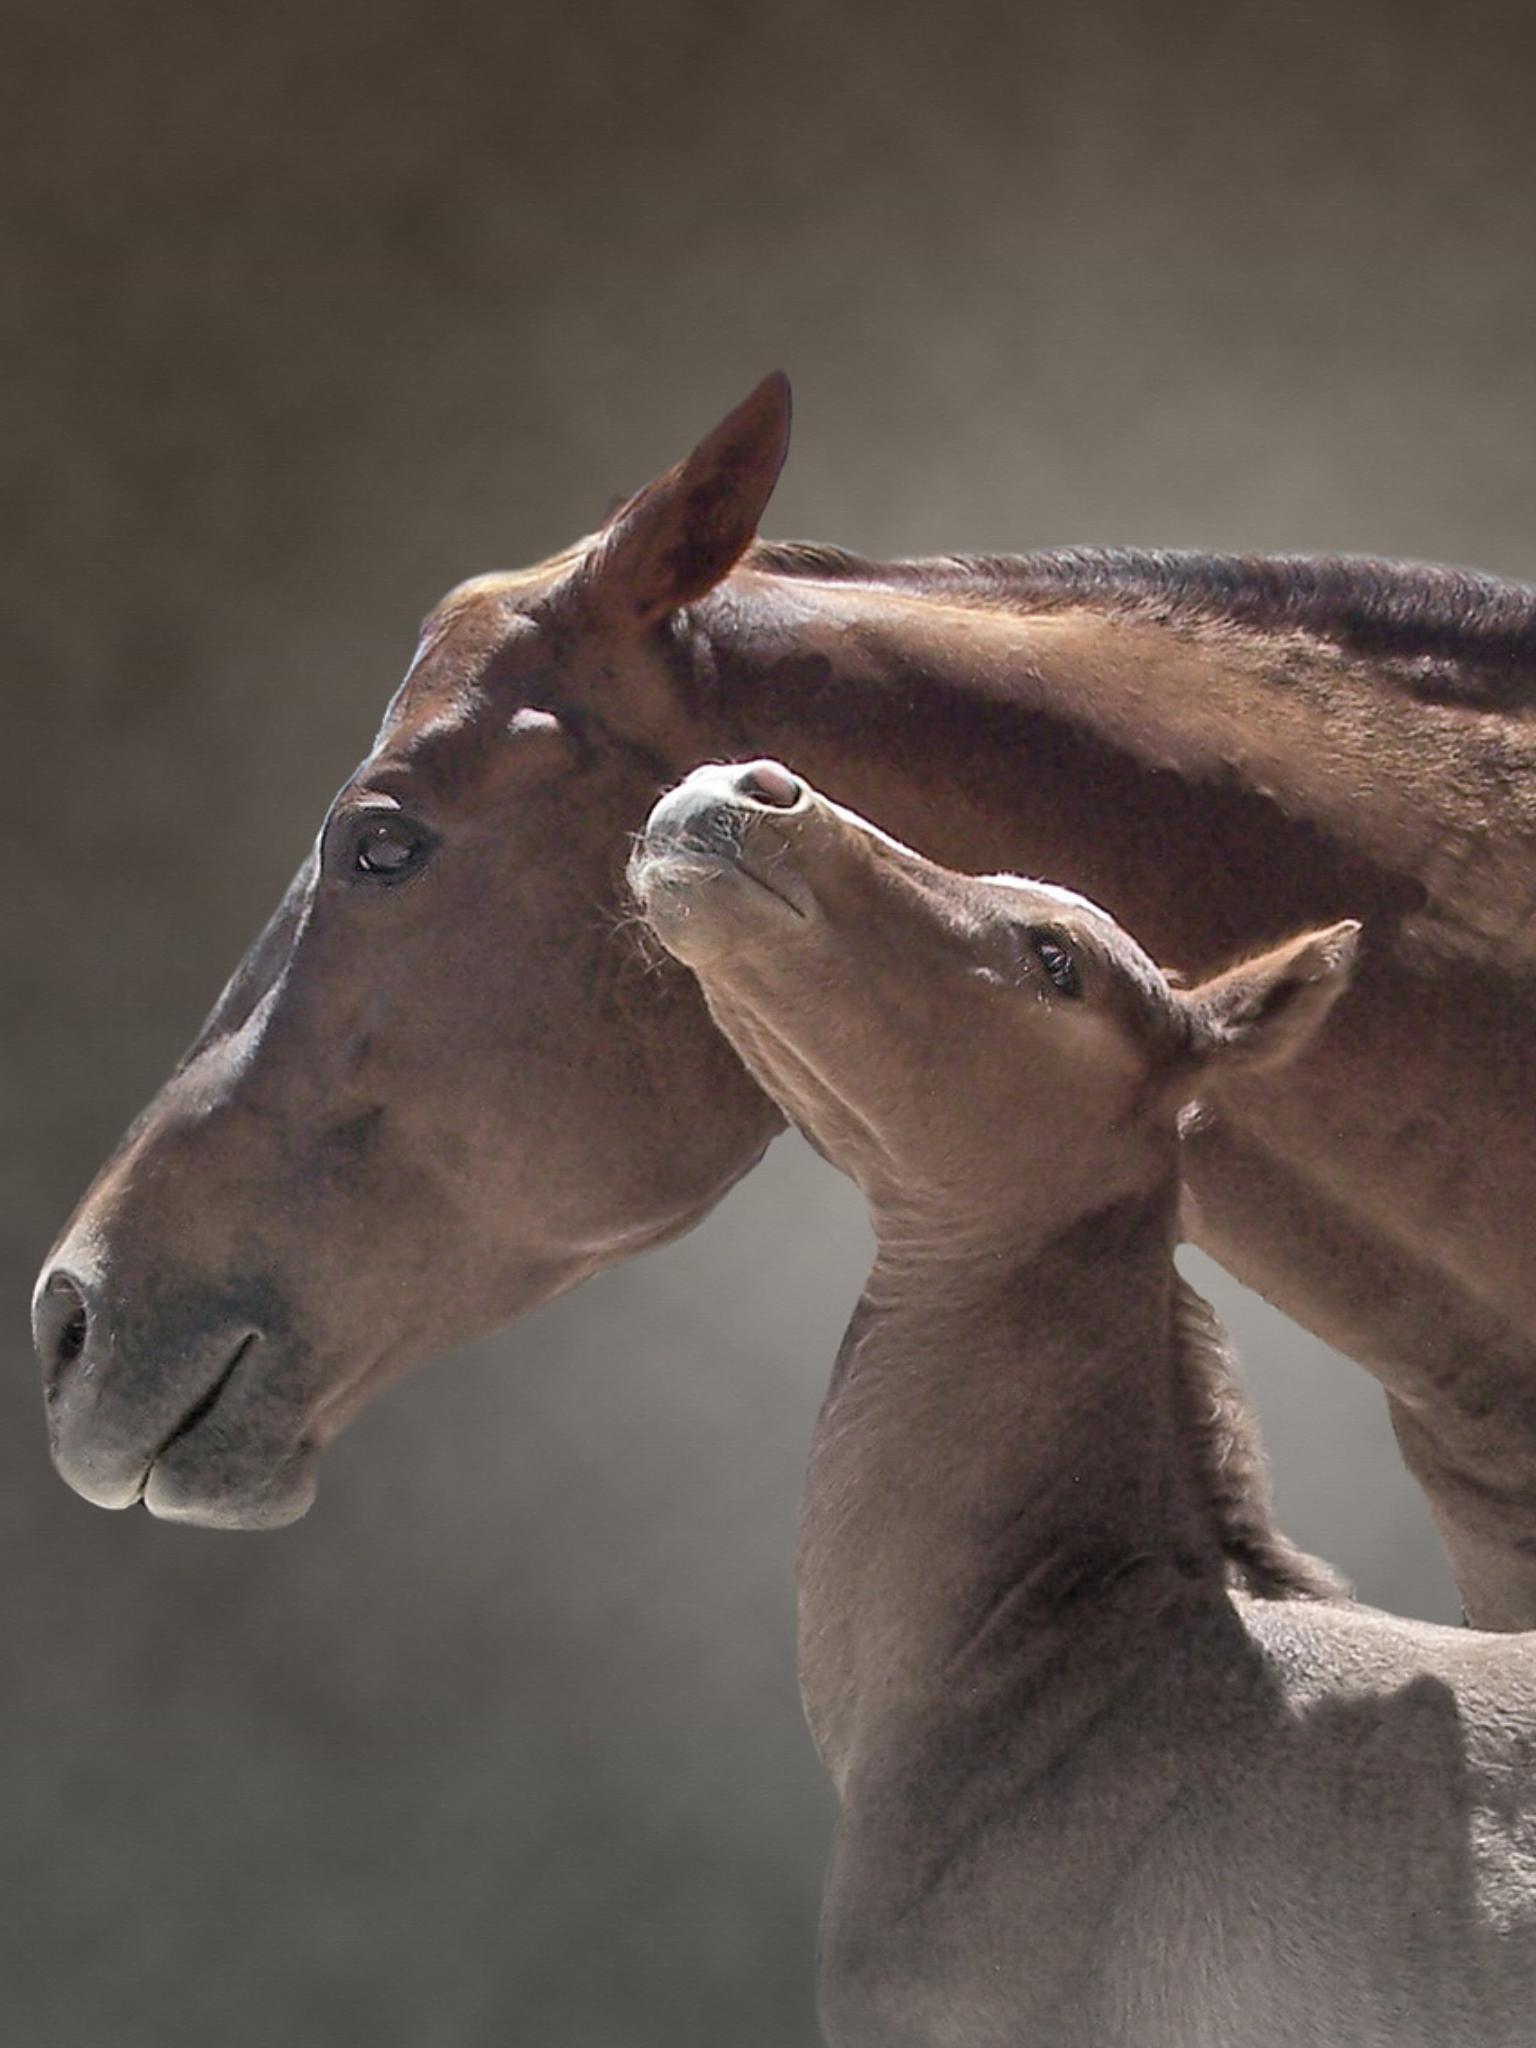 Horseanimals cutpets mothers crowdifyclub photos of